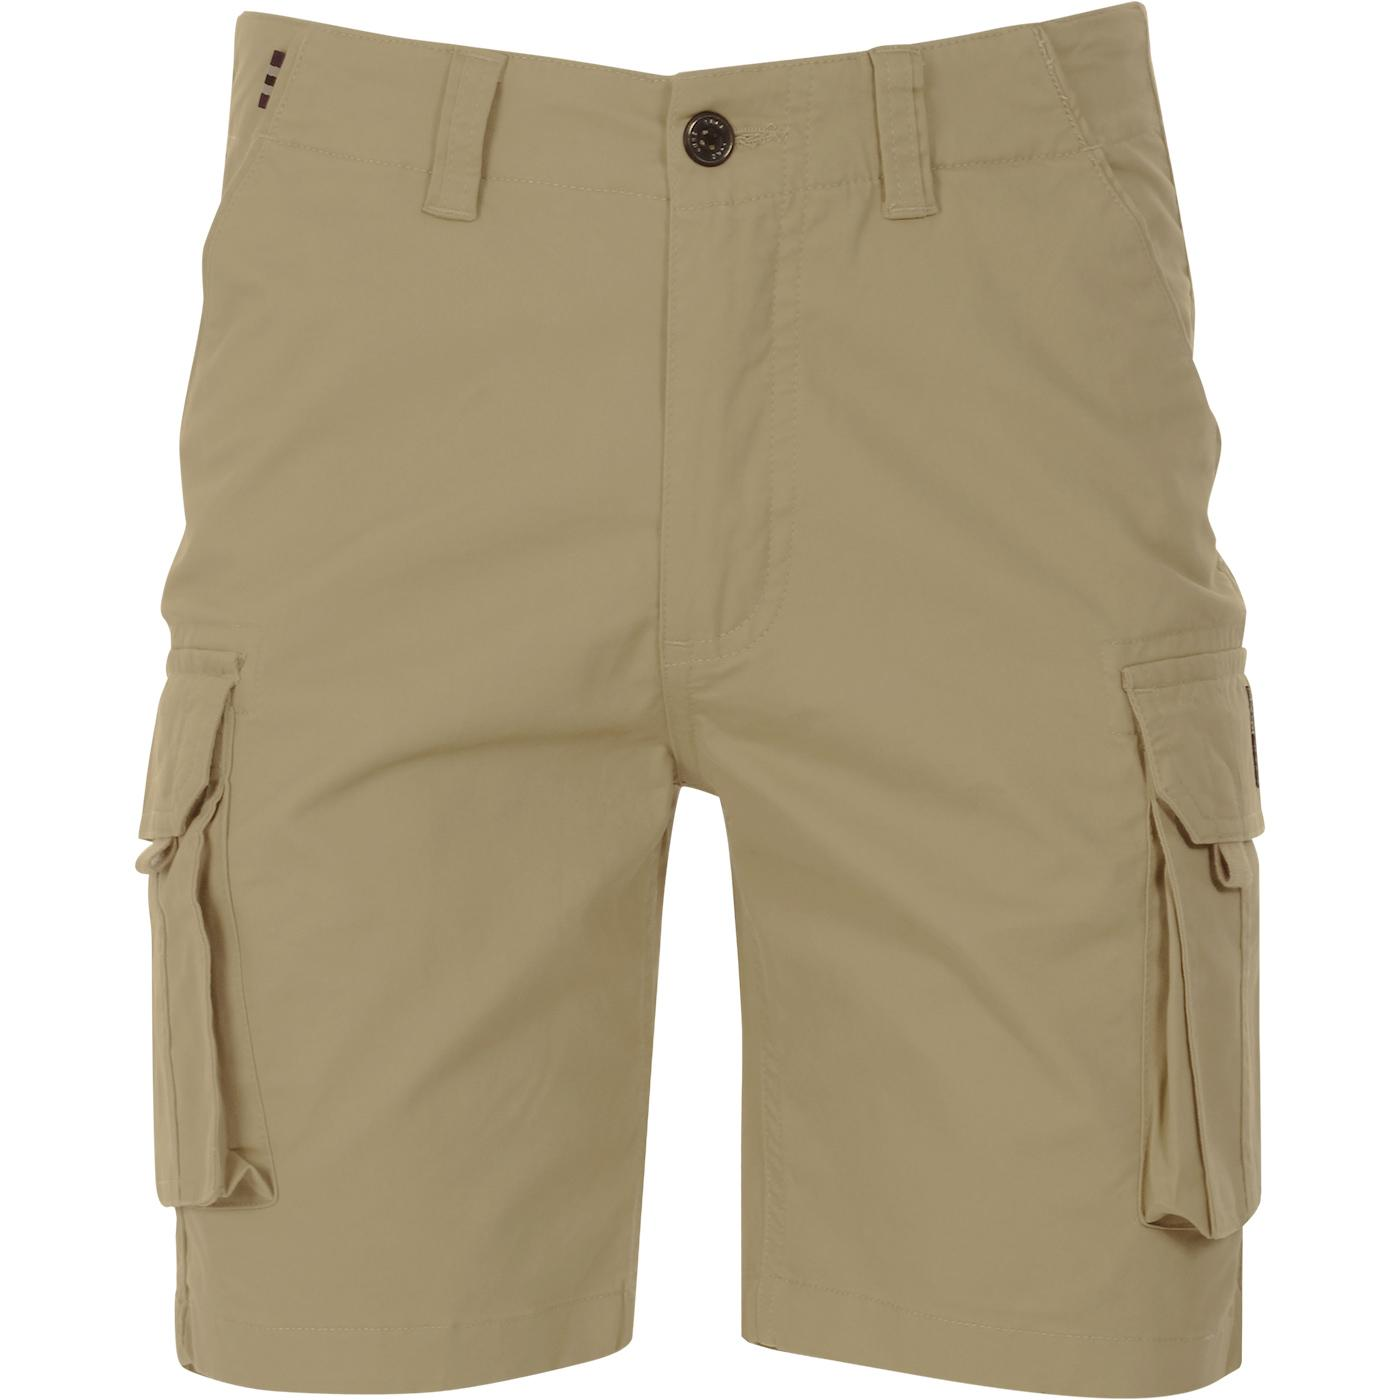 Cango LUKE Men's Retro Indie Cargo Shorts S